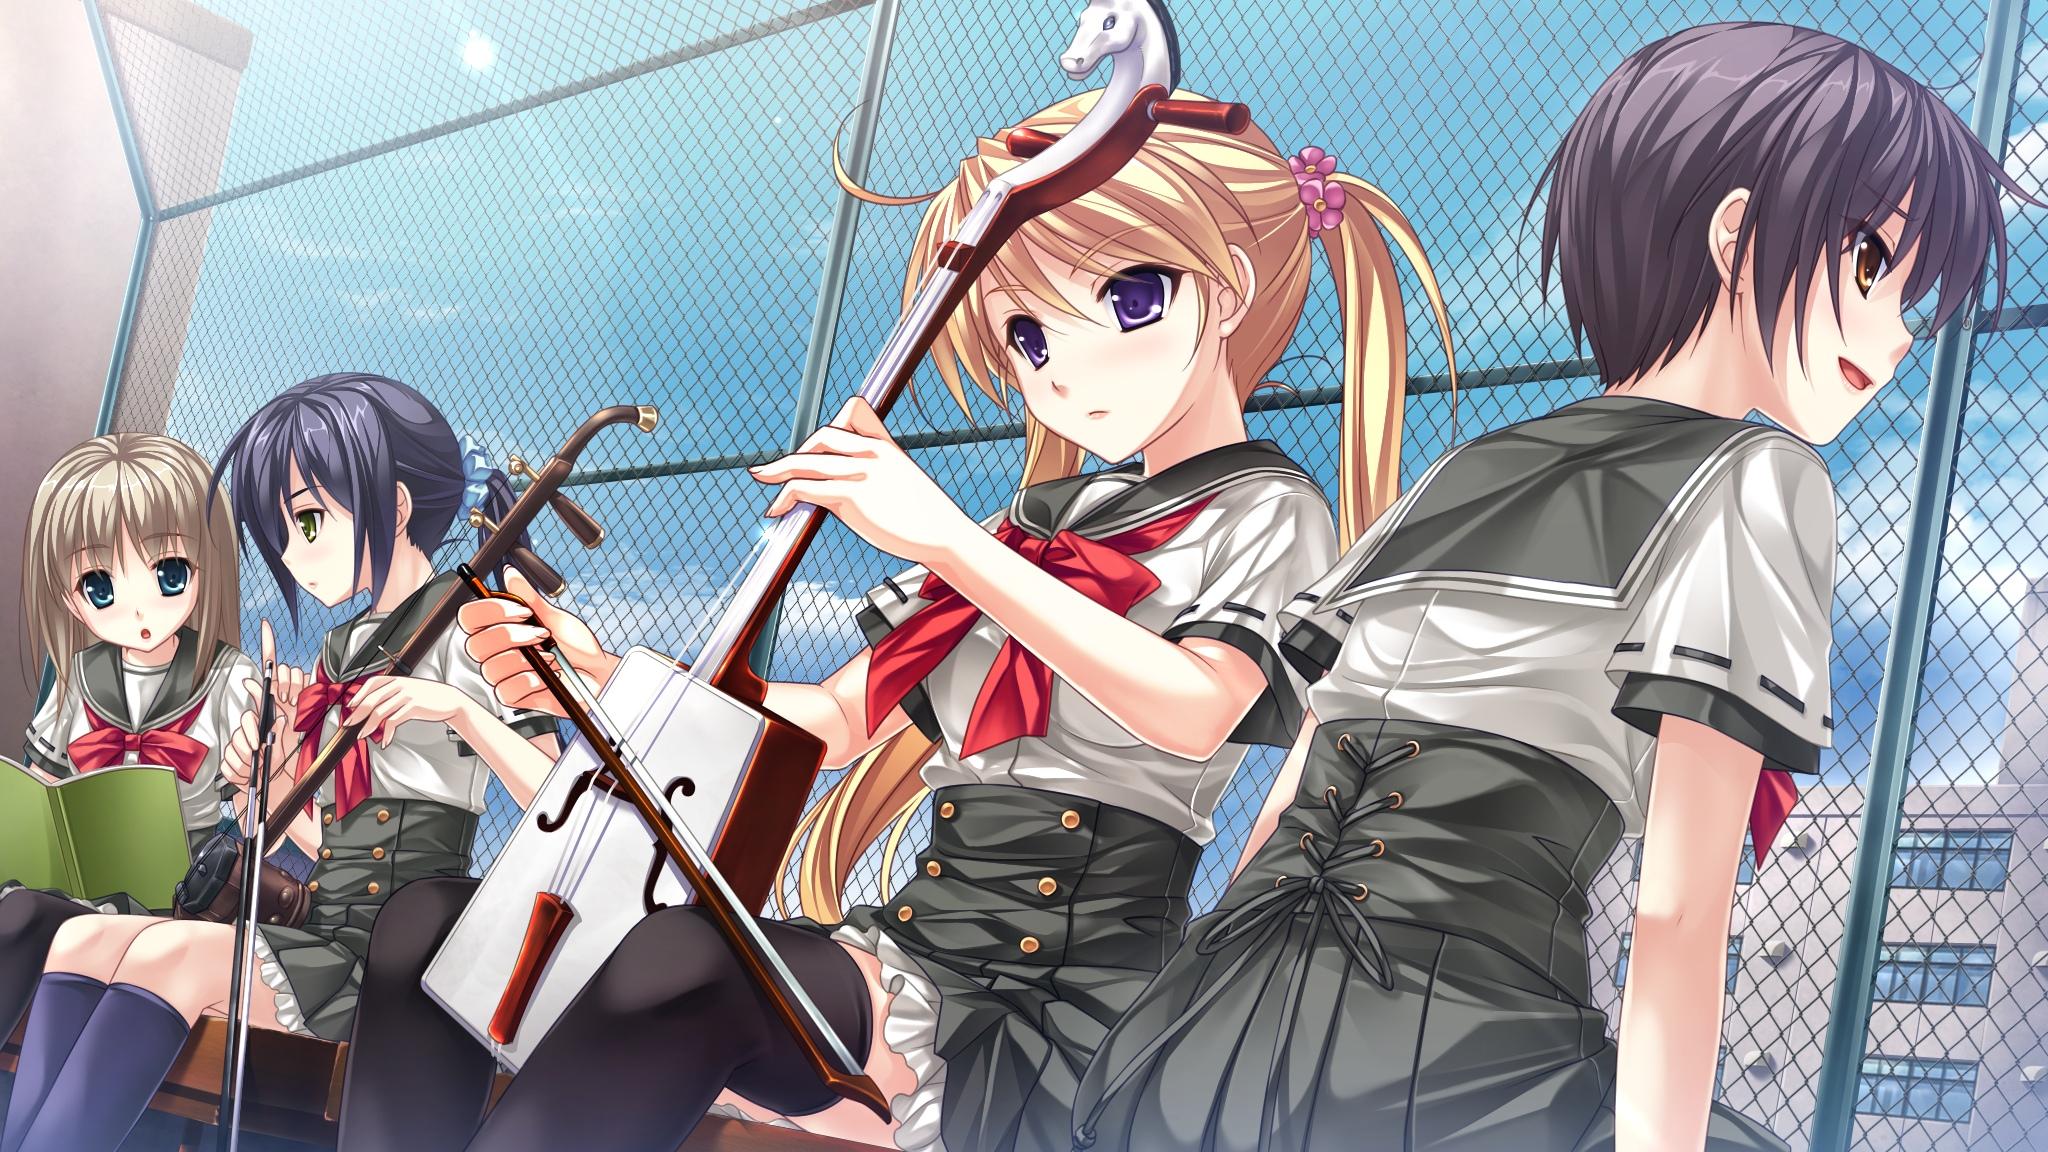 Amazing Tsukumo No Kanade Pictures & Backgrounds